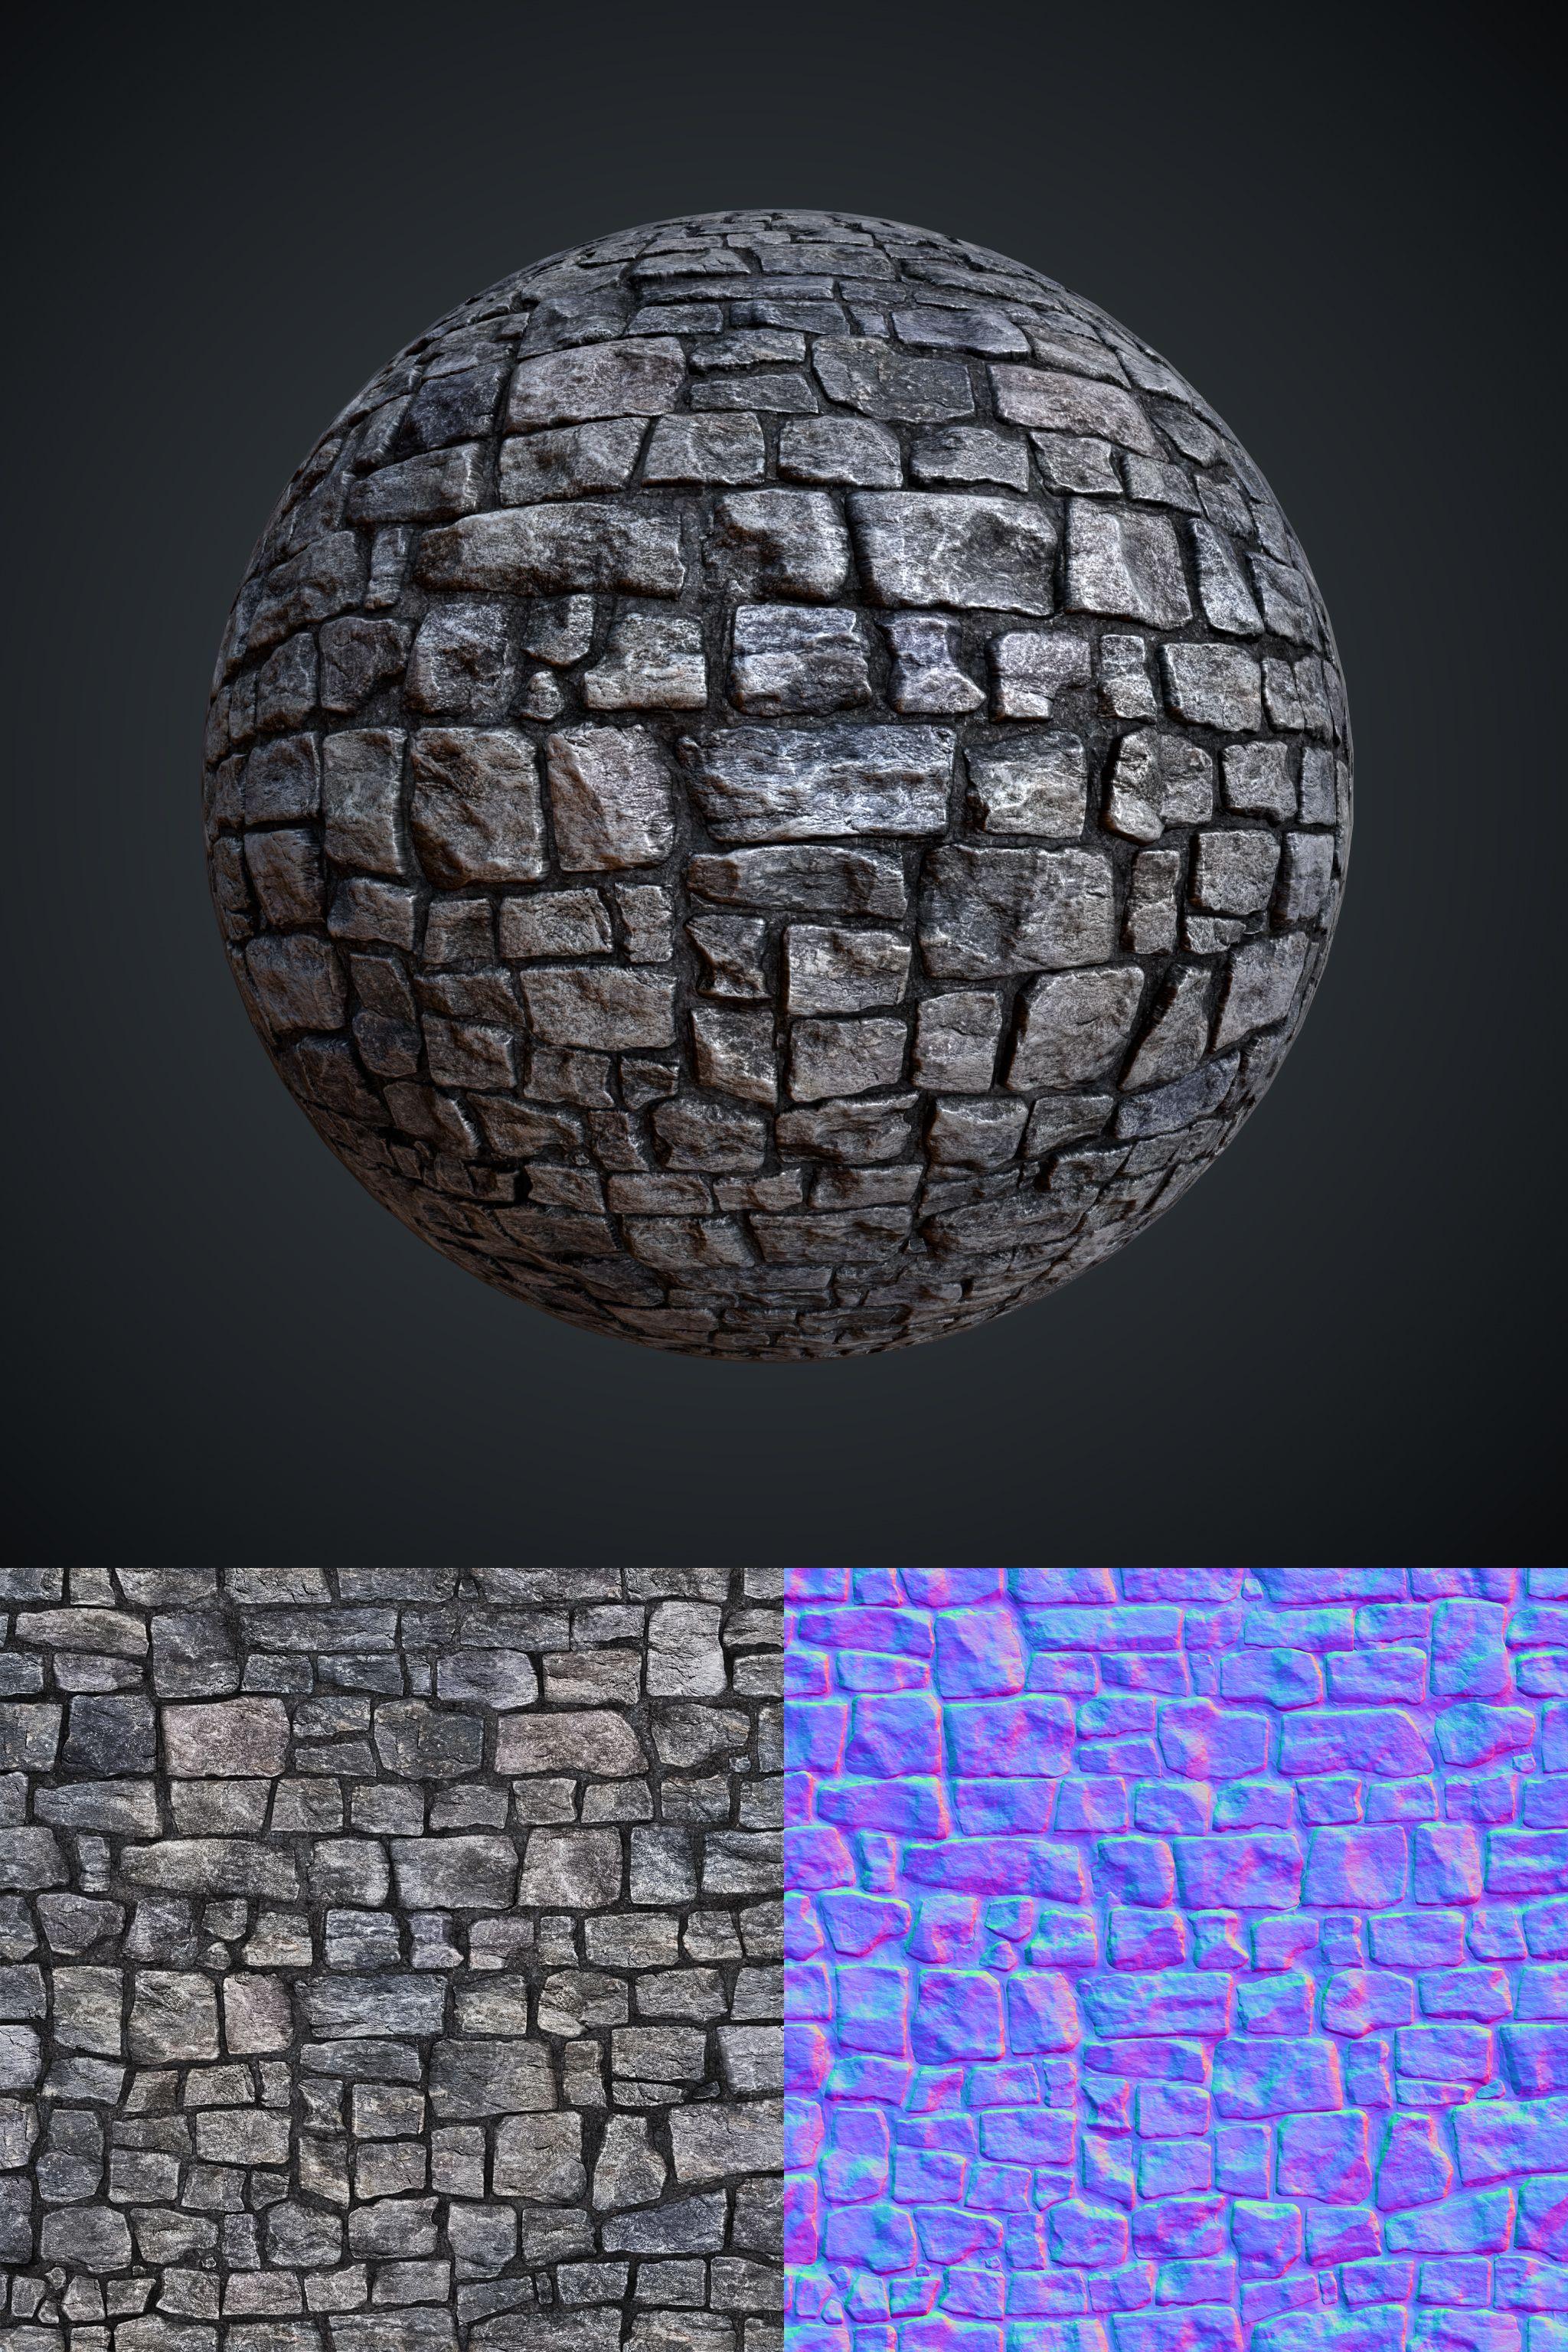 stone_wall_by_leonid_kd76d9ps.jpg (2048×3072) Blender